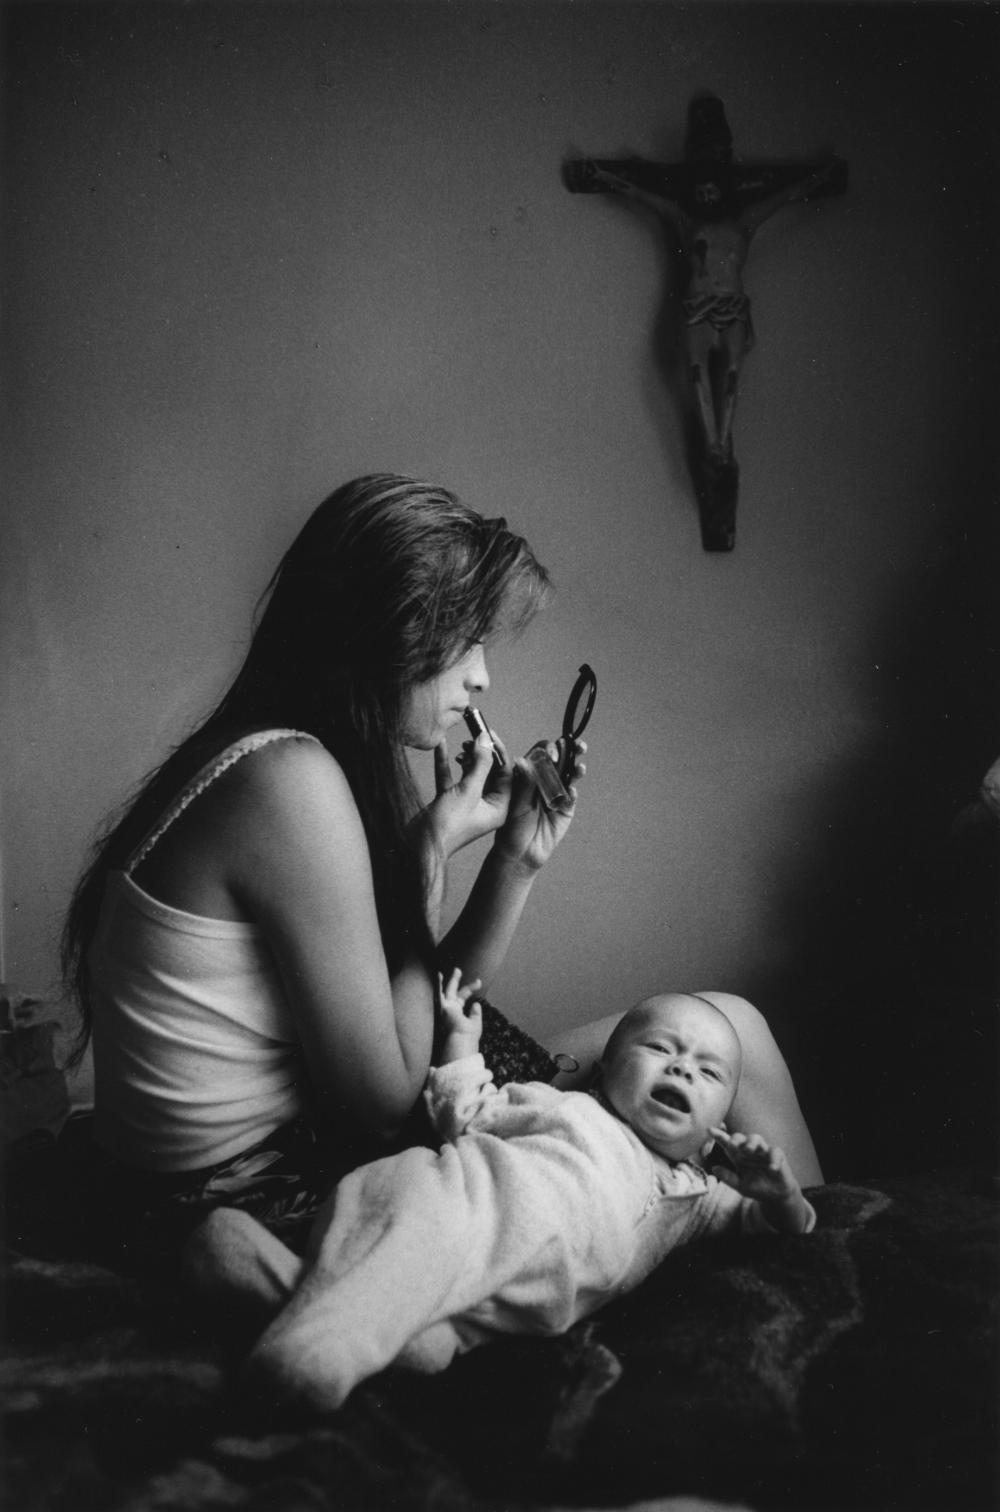 Chola Girls Naked Ele portraits of 70's & 80's cholas culture -